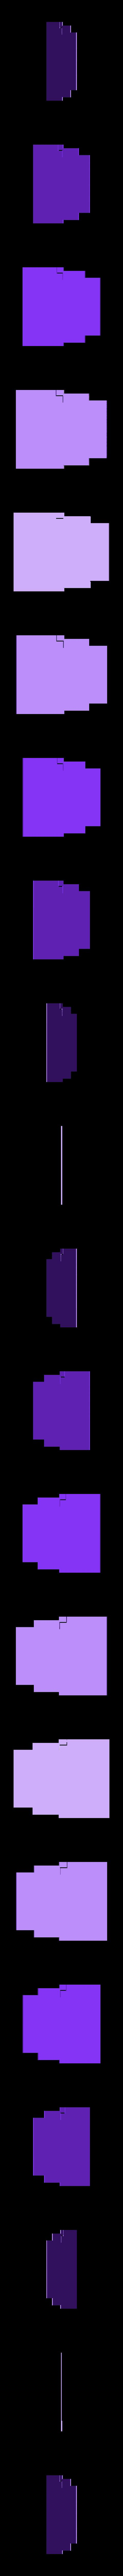 Color2_Grass.stl Download free STL file Nordic-Inspired Multi-color Architectural Model • 3D printer model, MosaicManufacturing